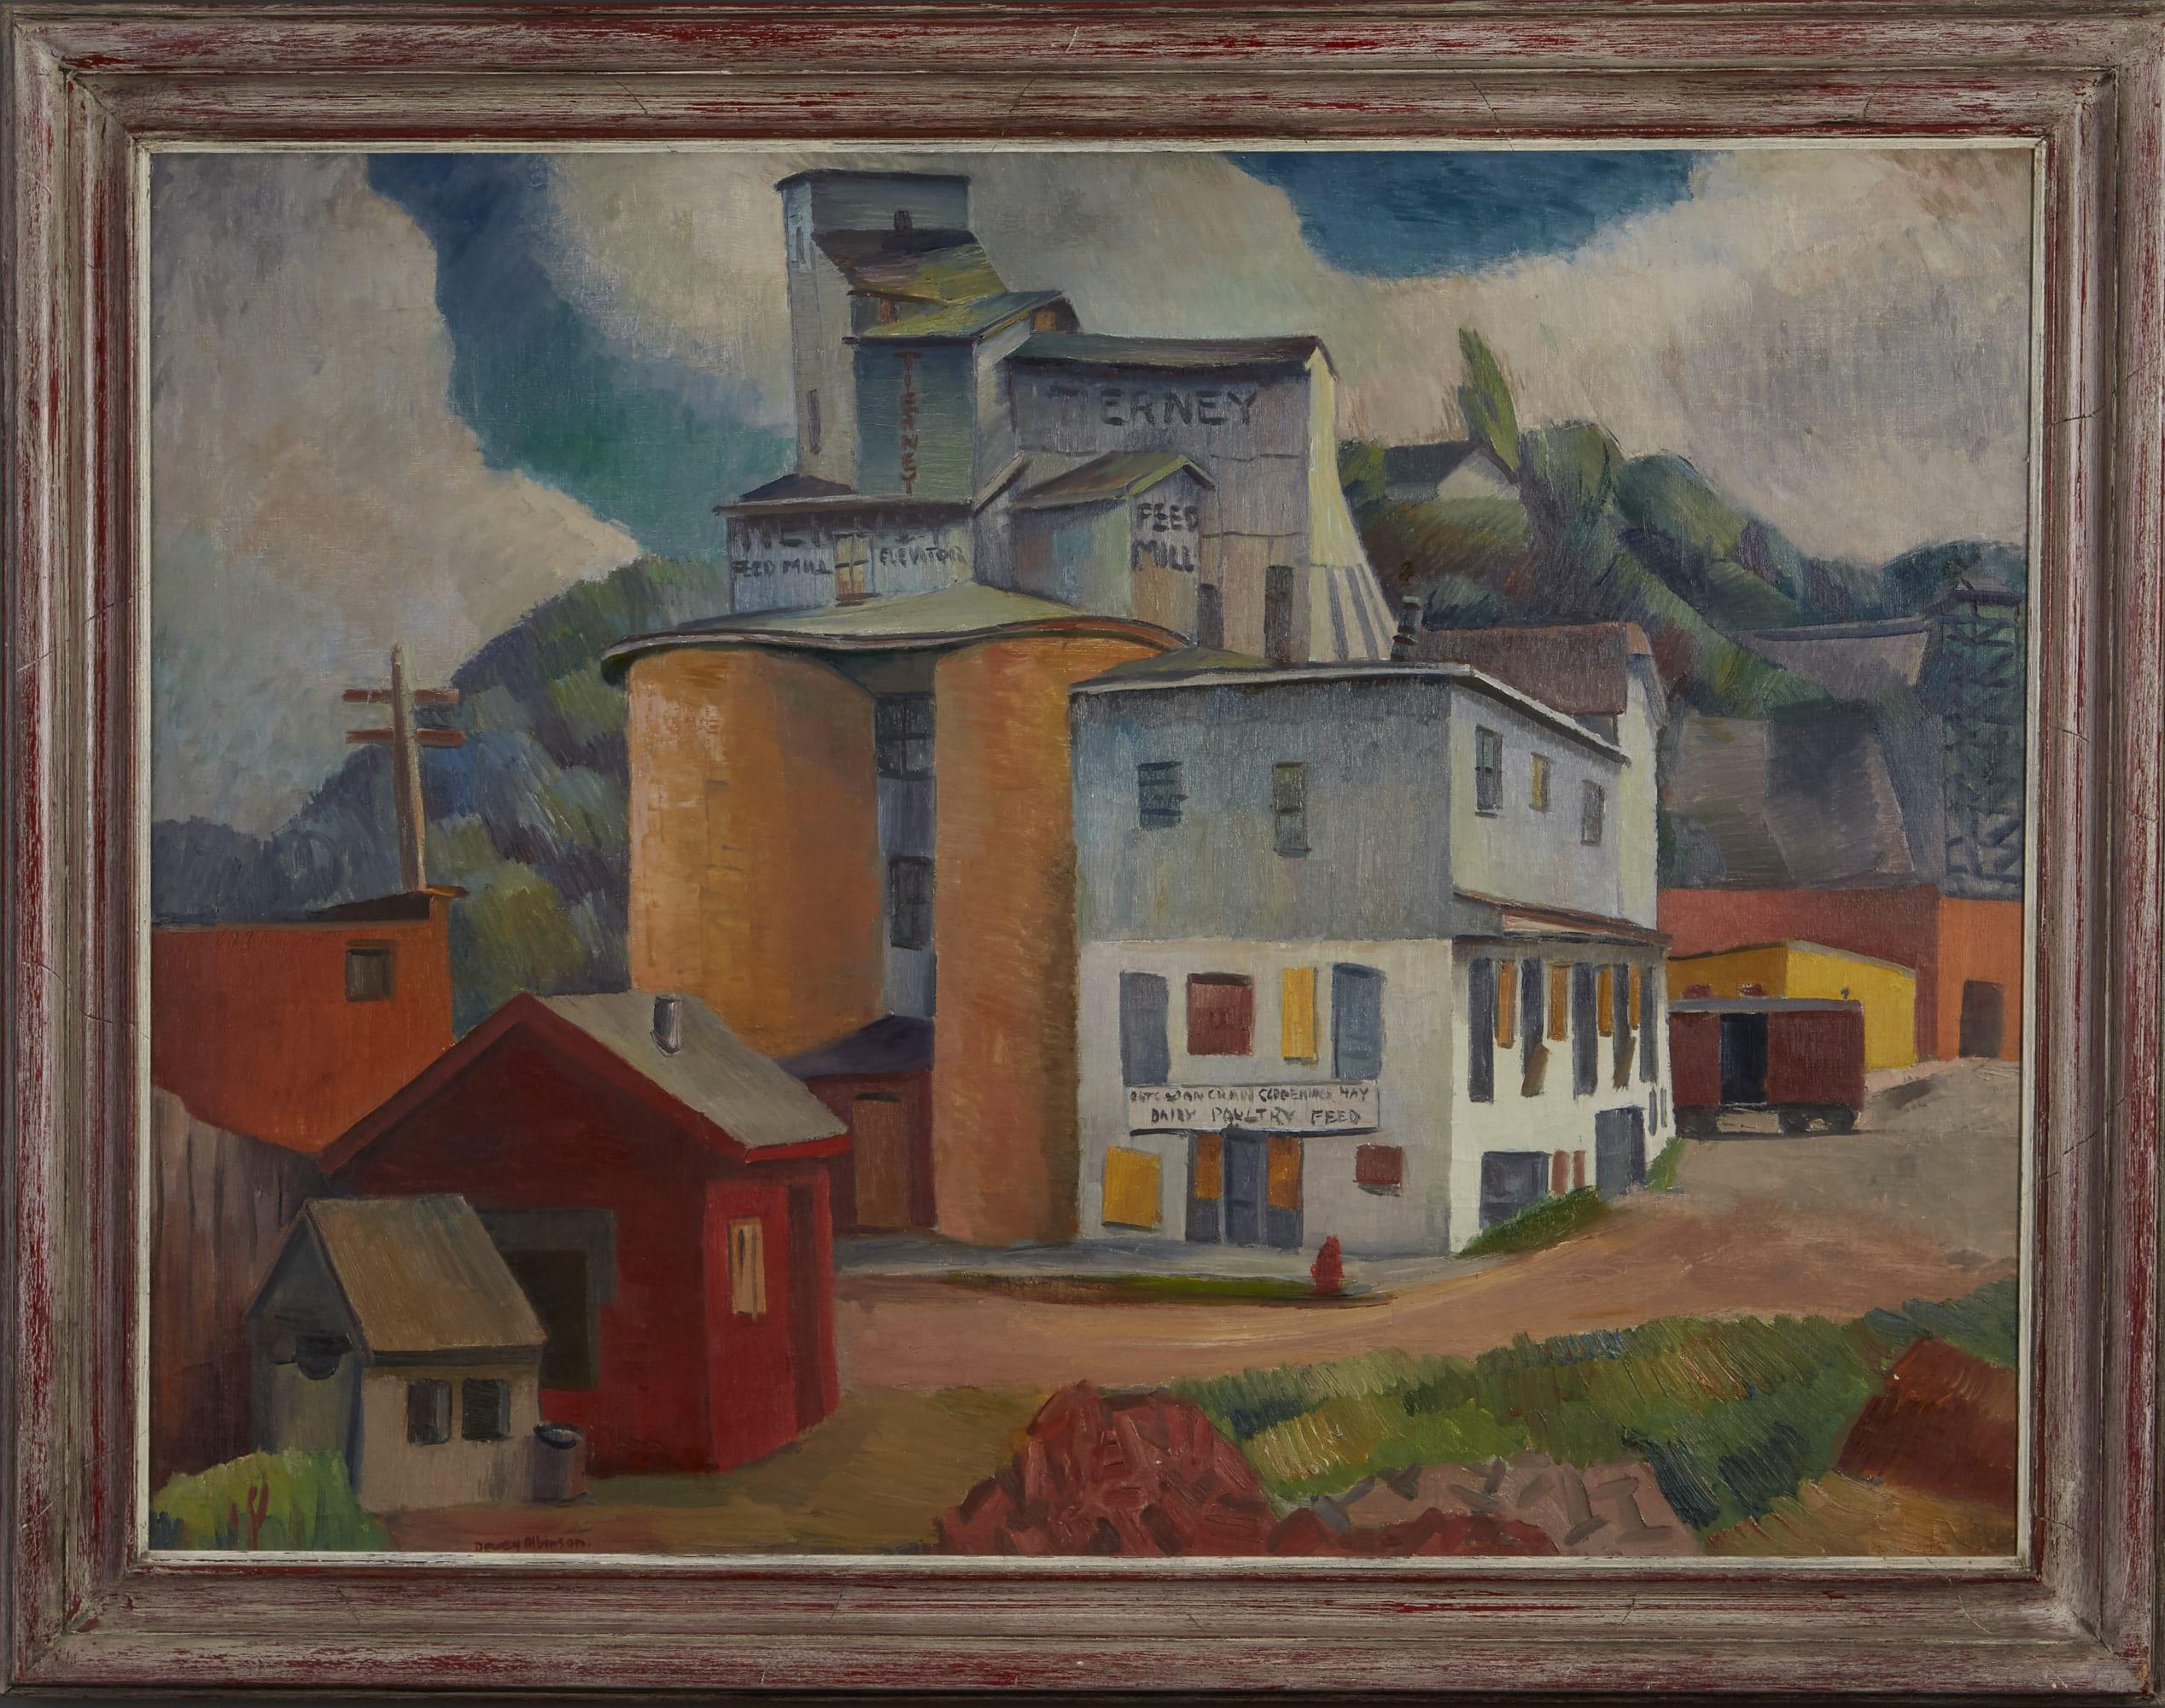 Lot 006: Dewey Albinson Tierney Mills Oil on Canvas